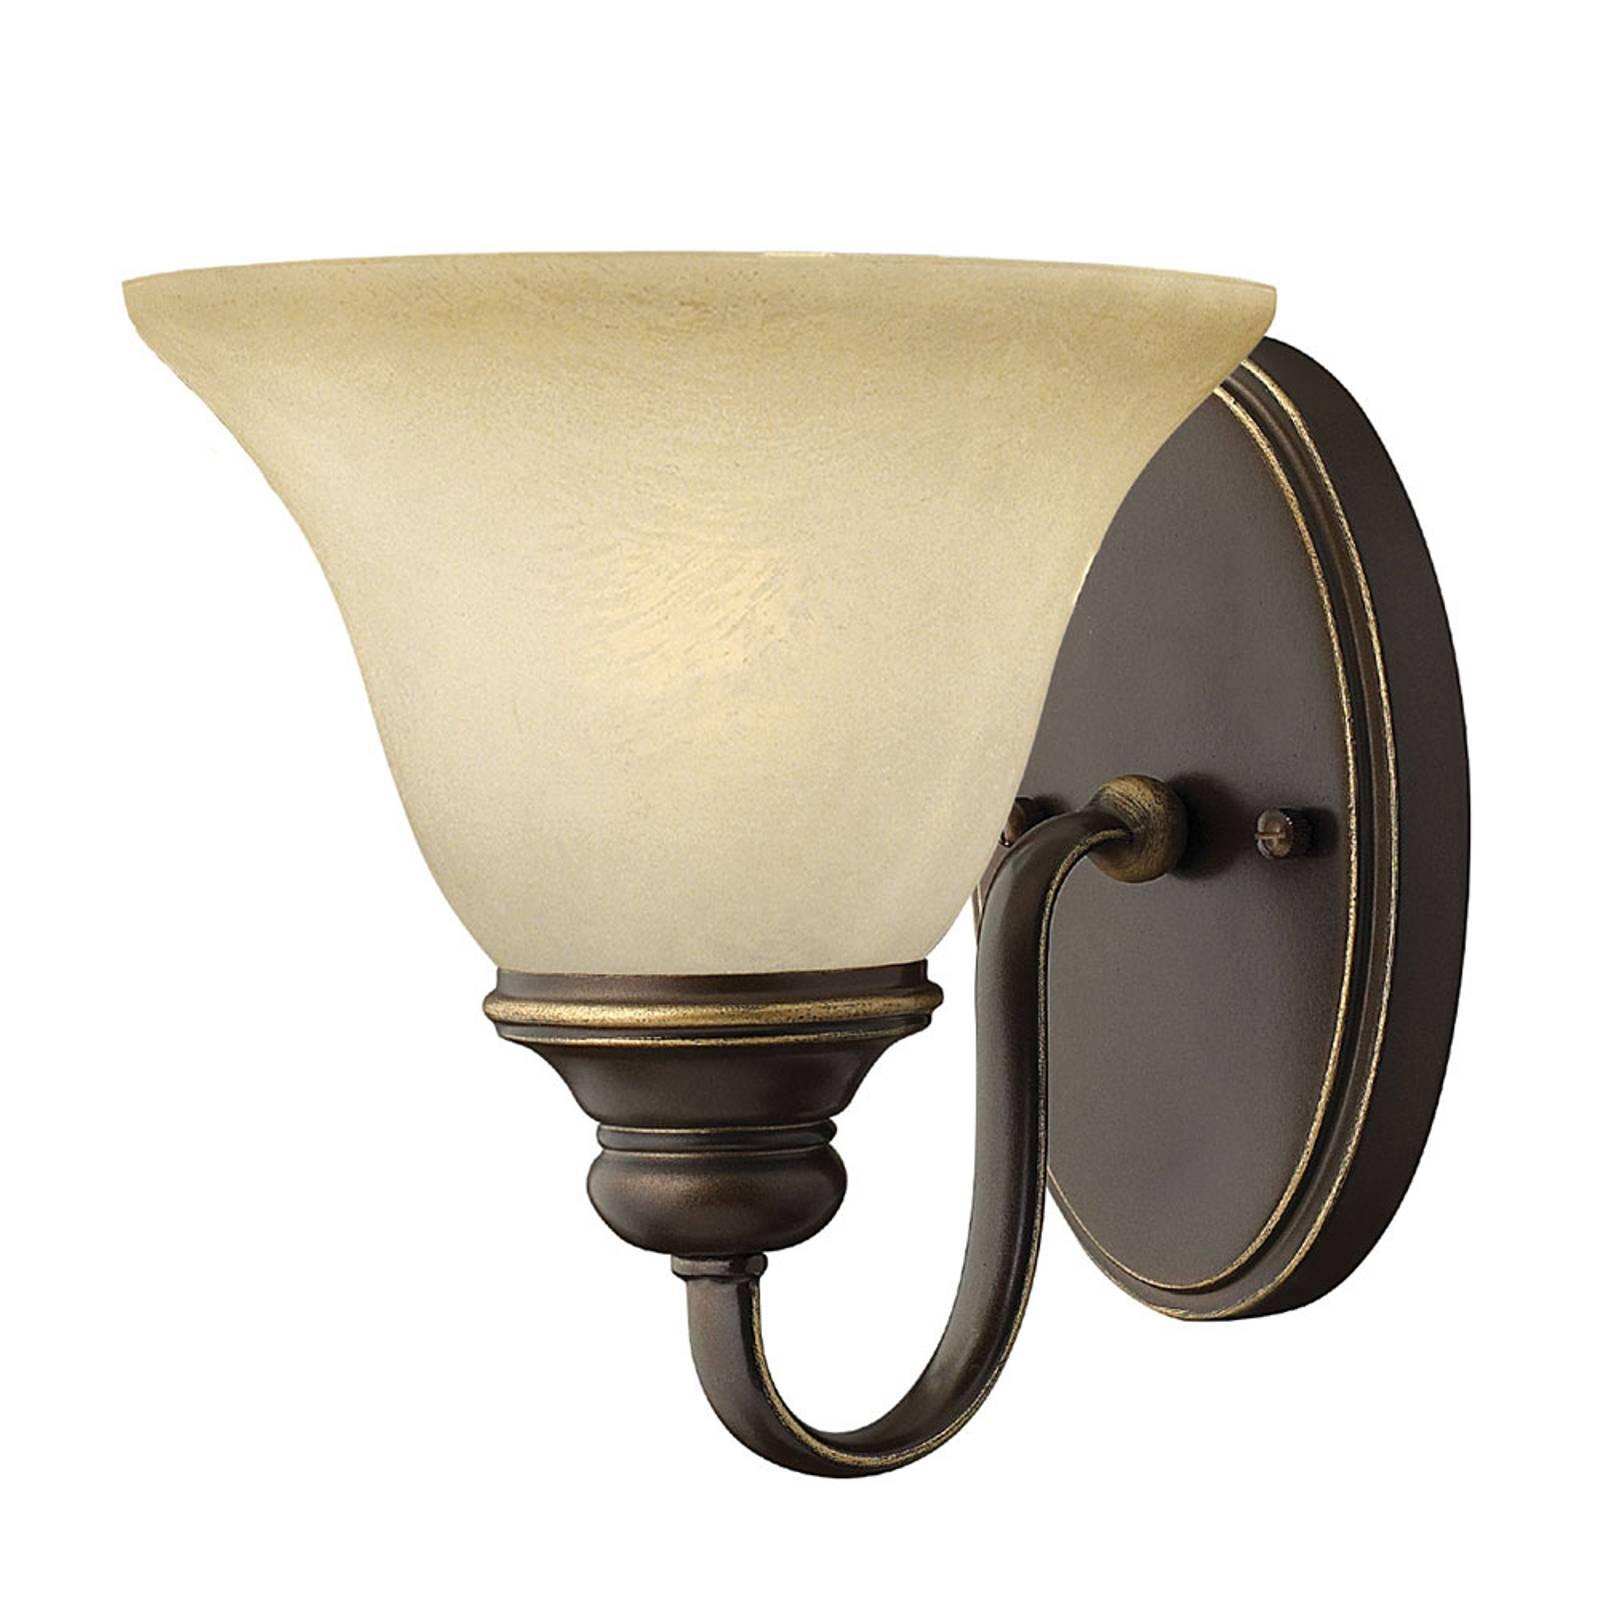 Cello klassieke wandlamp